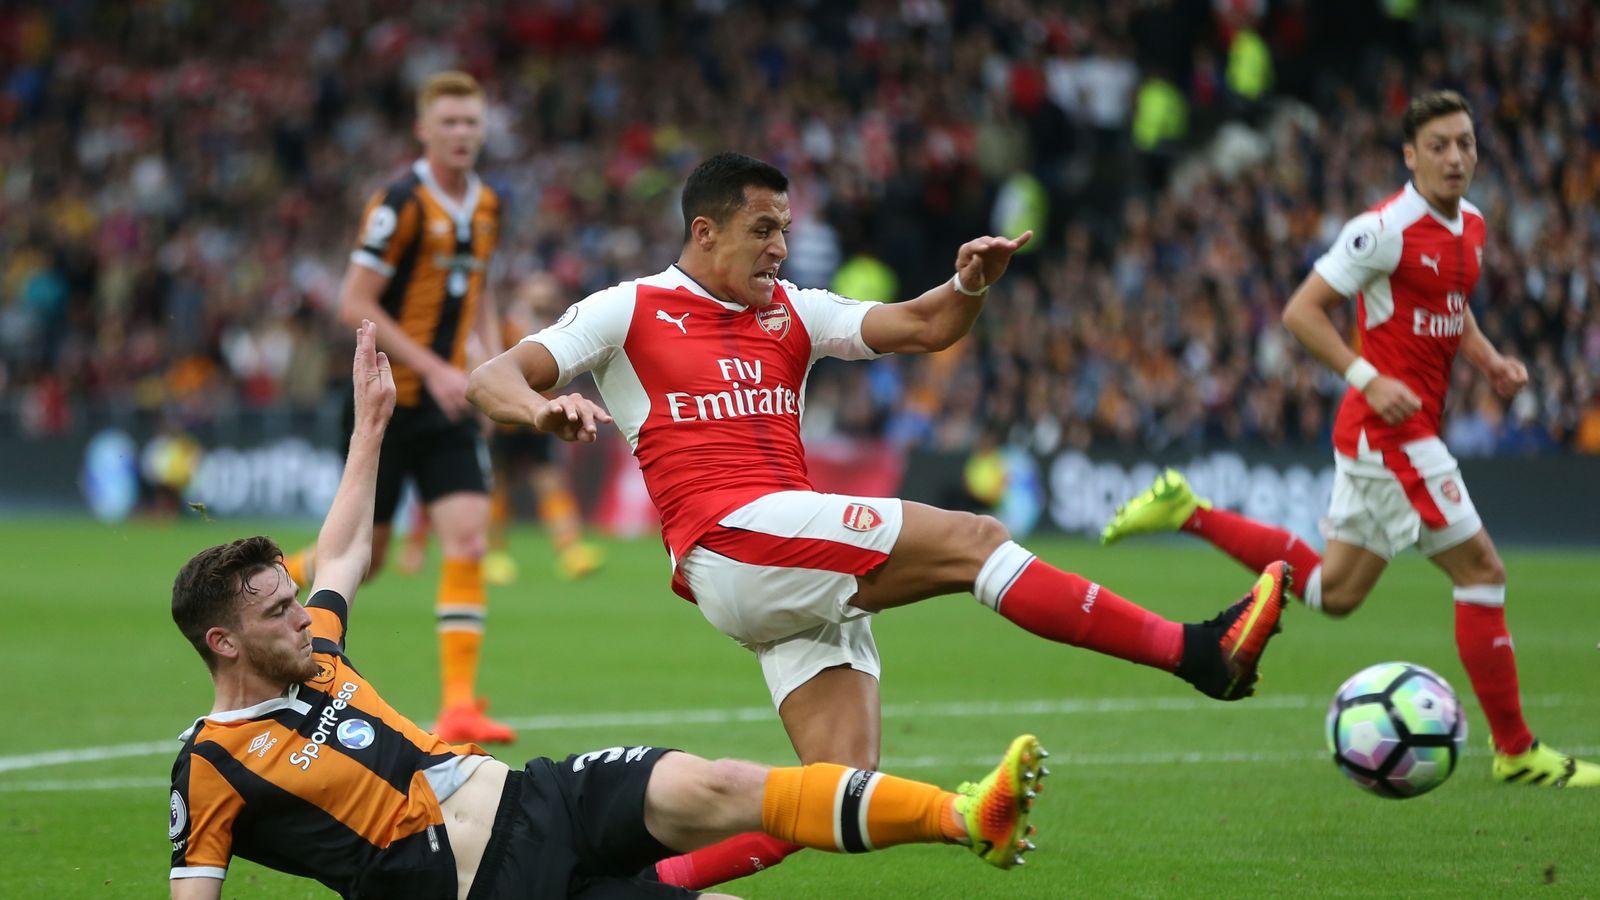 Hull City 1 - 4 Arsenal - Match Report & Highlights